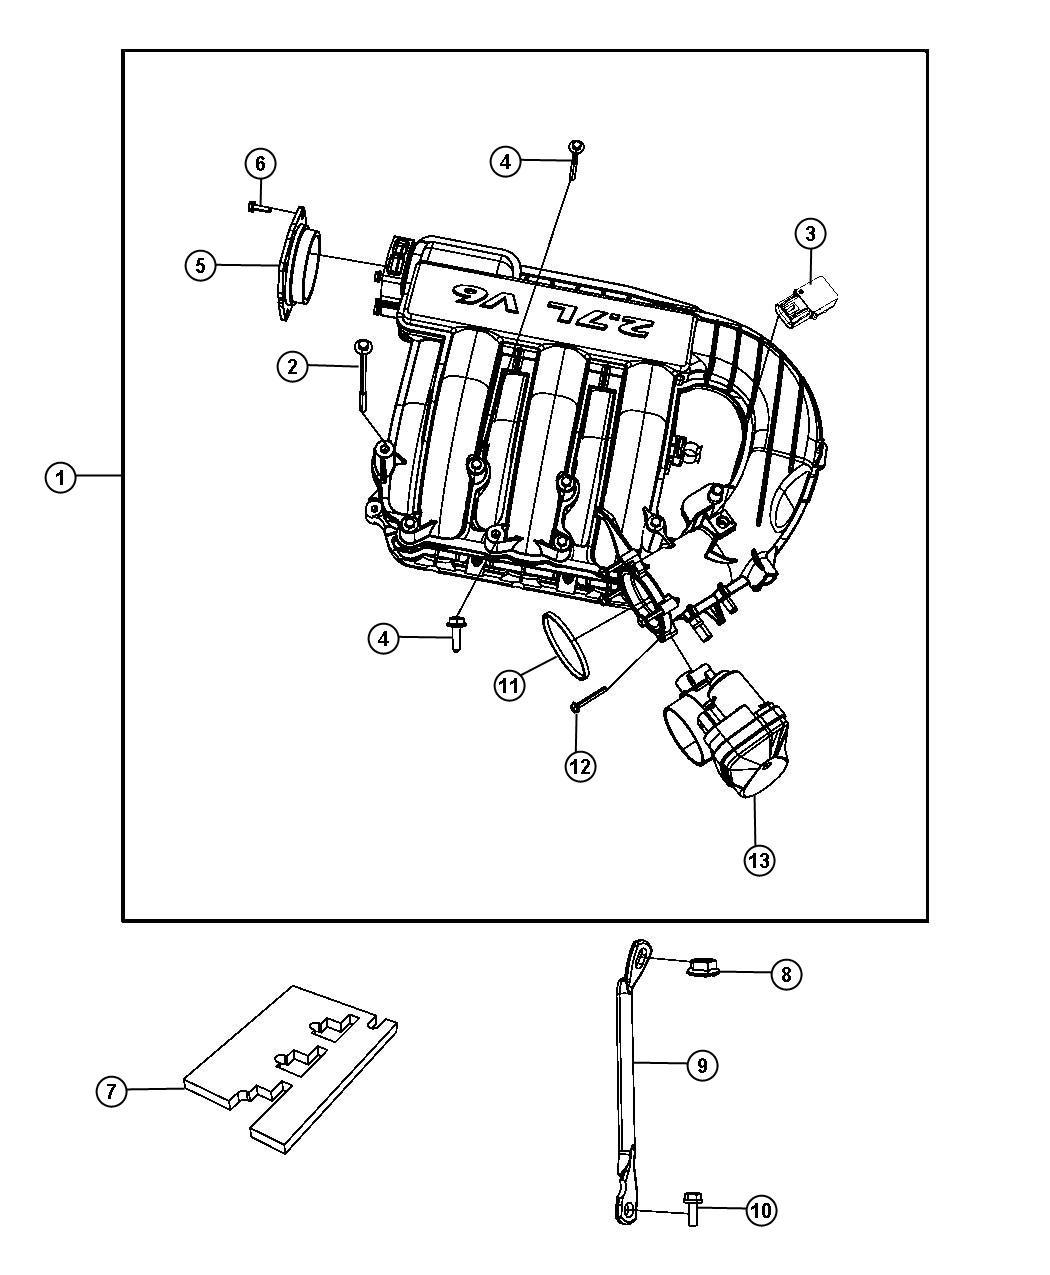 2004 dodge neon sxt stereo wiring diagram trail tech striker egr valve location 1995 lexus get free image about